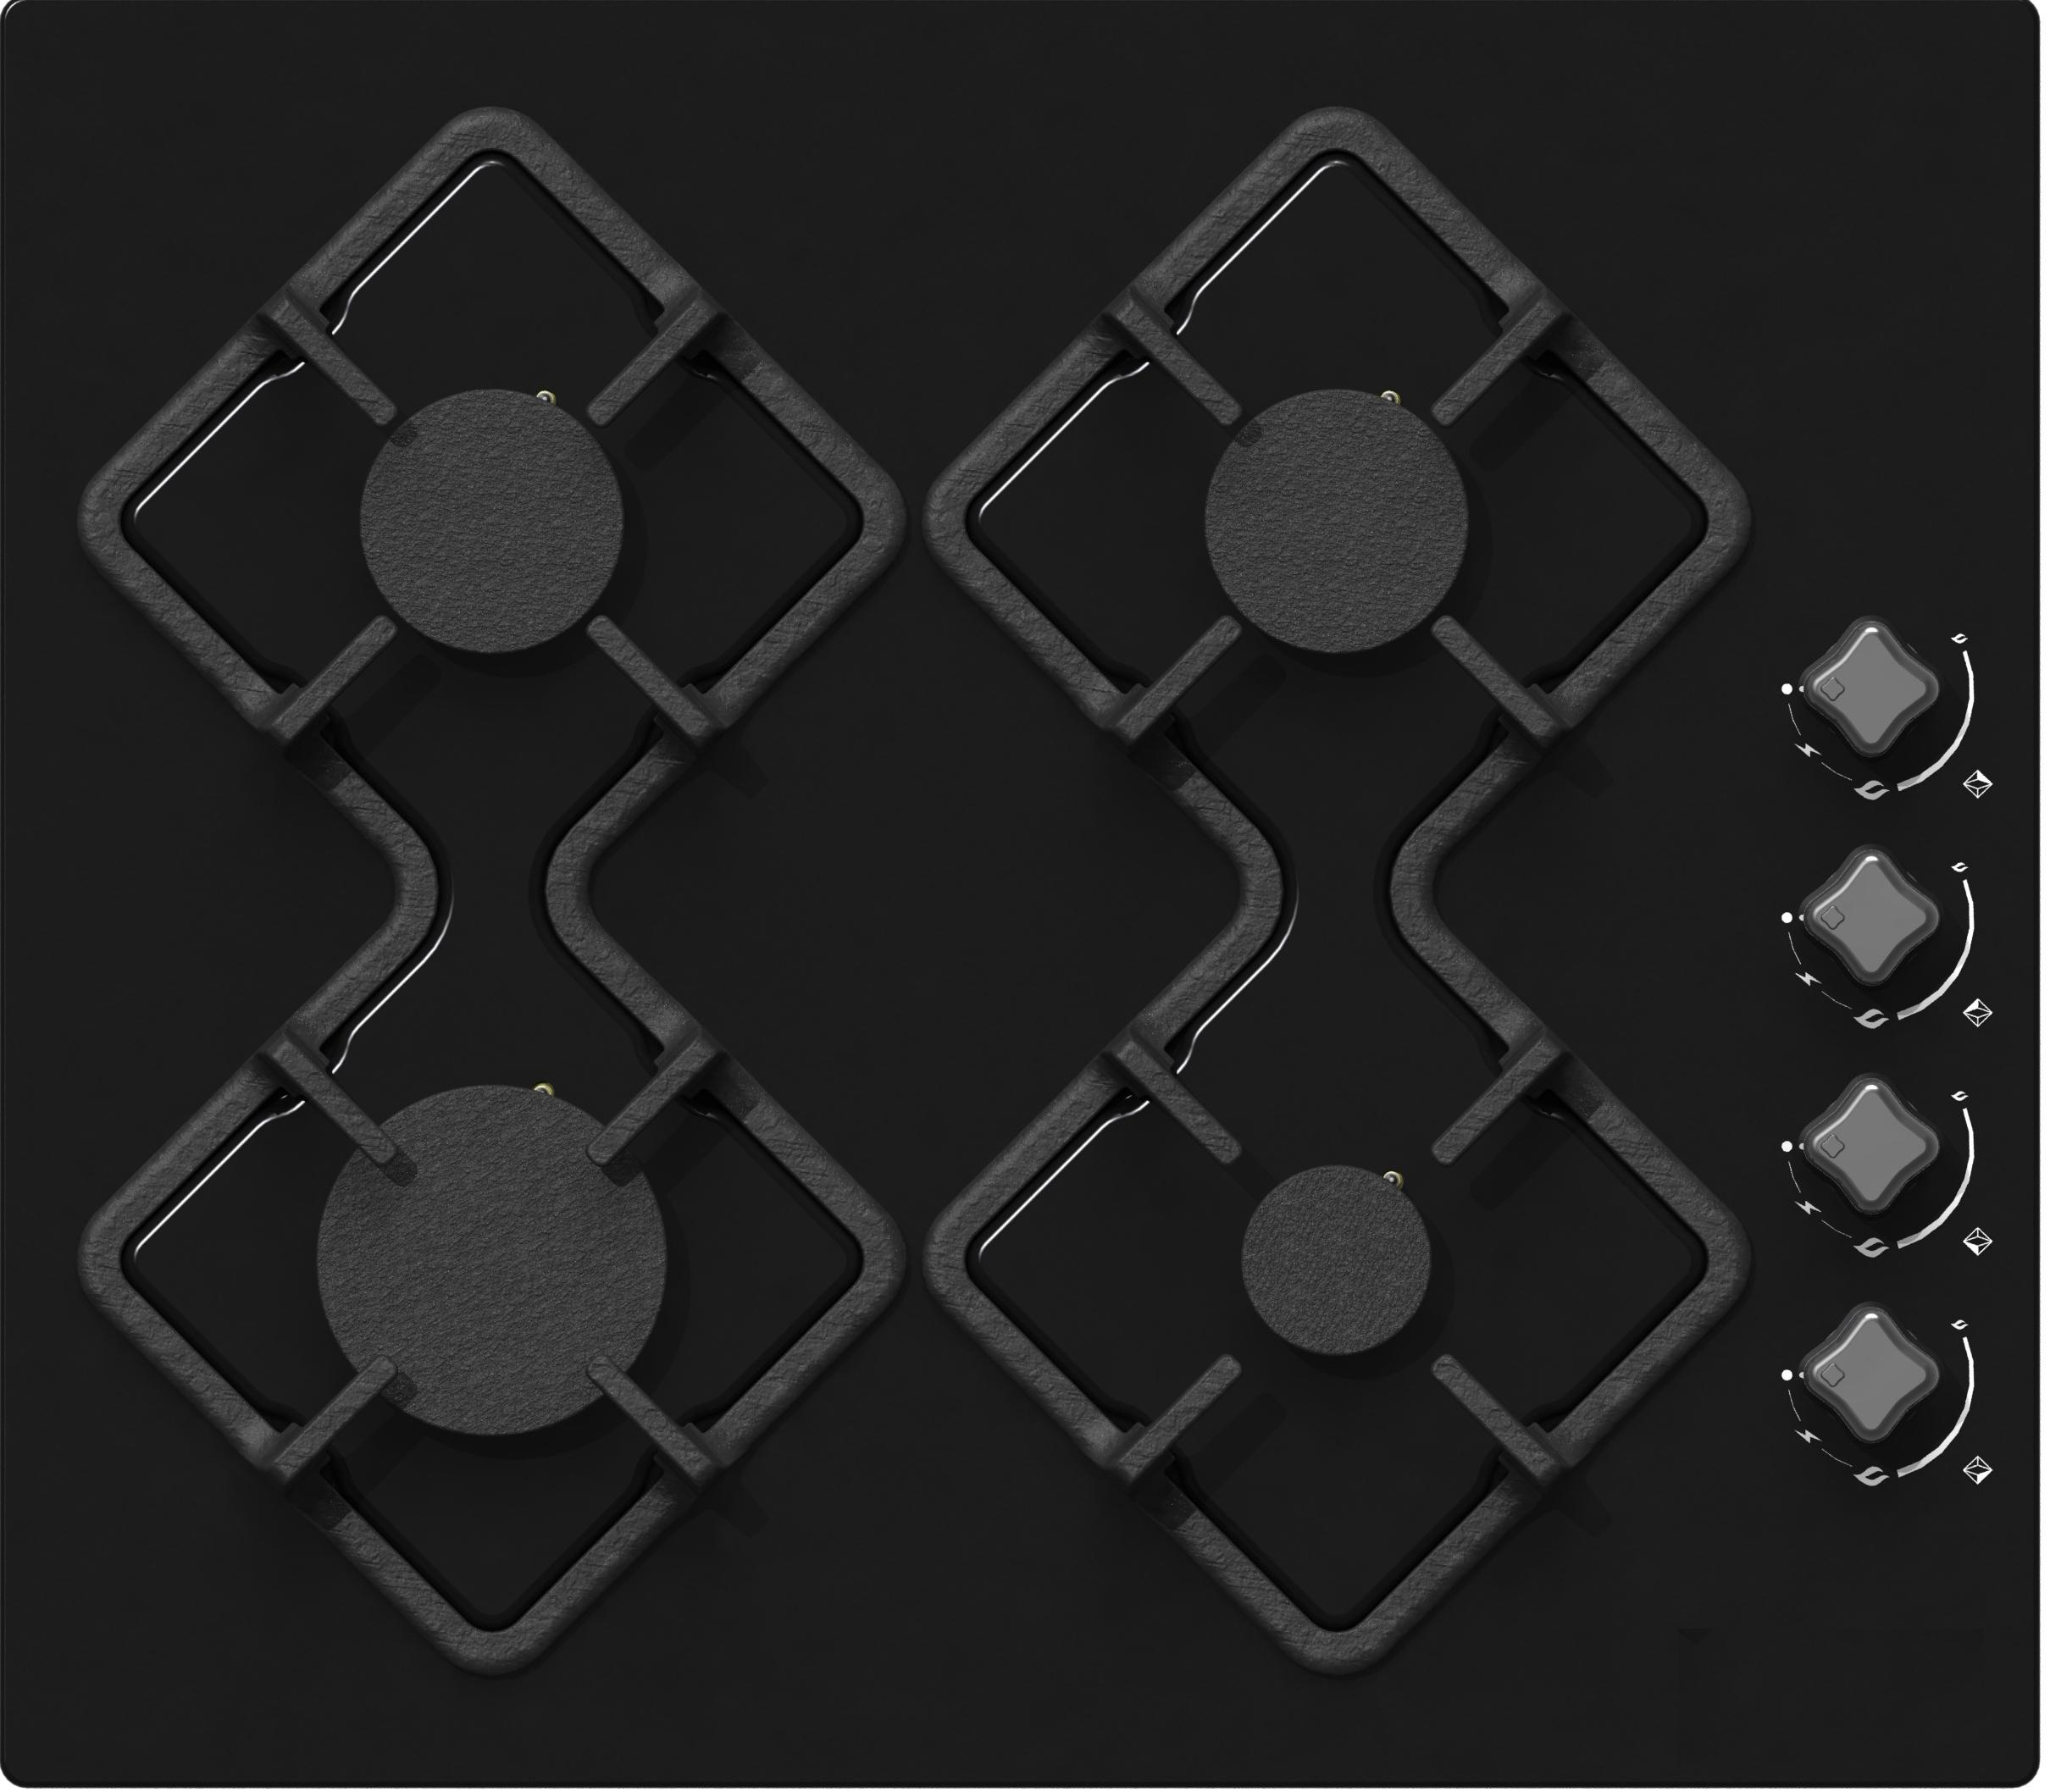 Встраиваемая газовая варочная панель Ricci Rgn-ka4007bl встраиваемая газовая варочная панель smeg srv 876 pogh